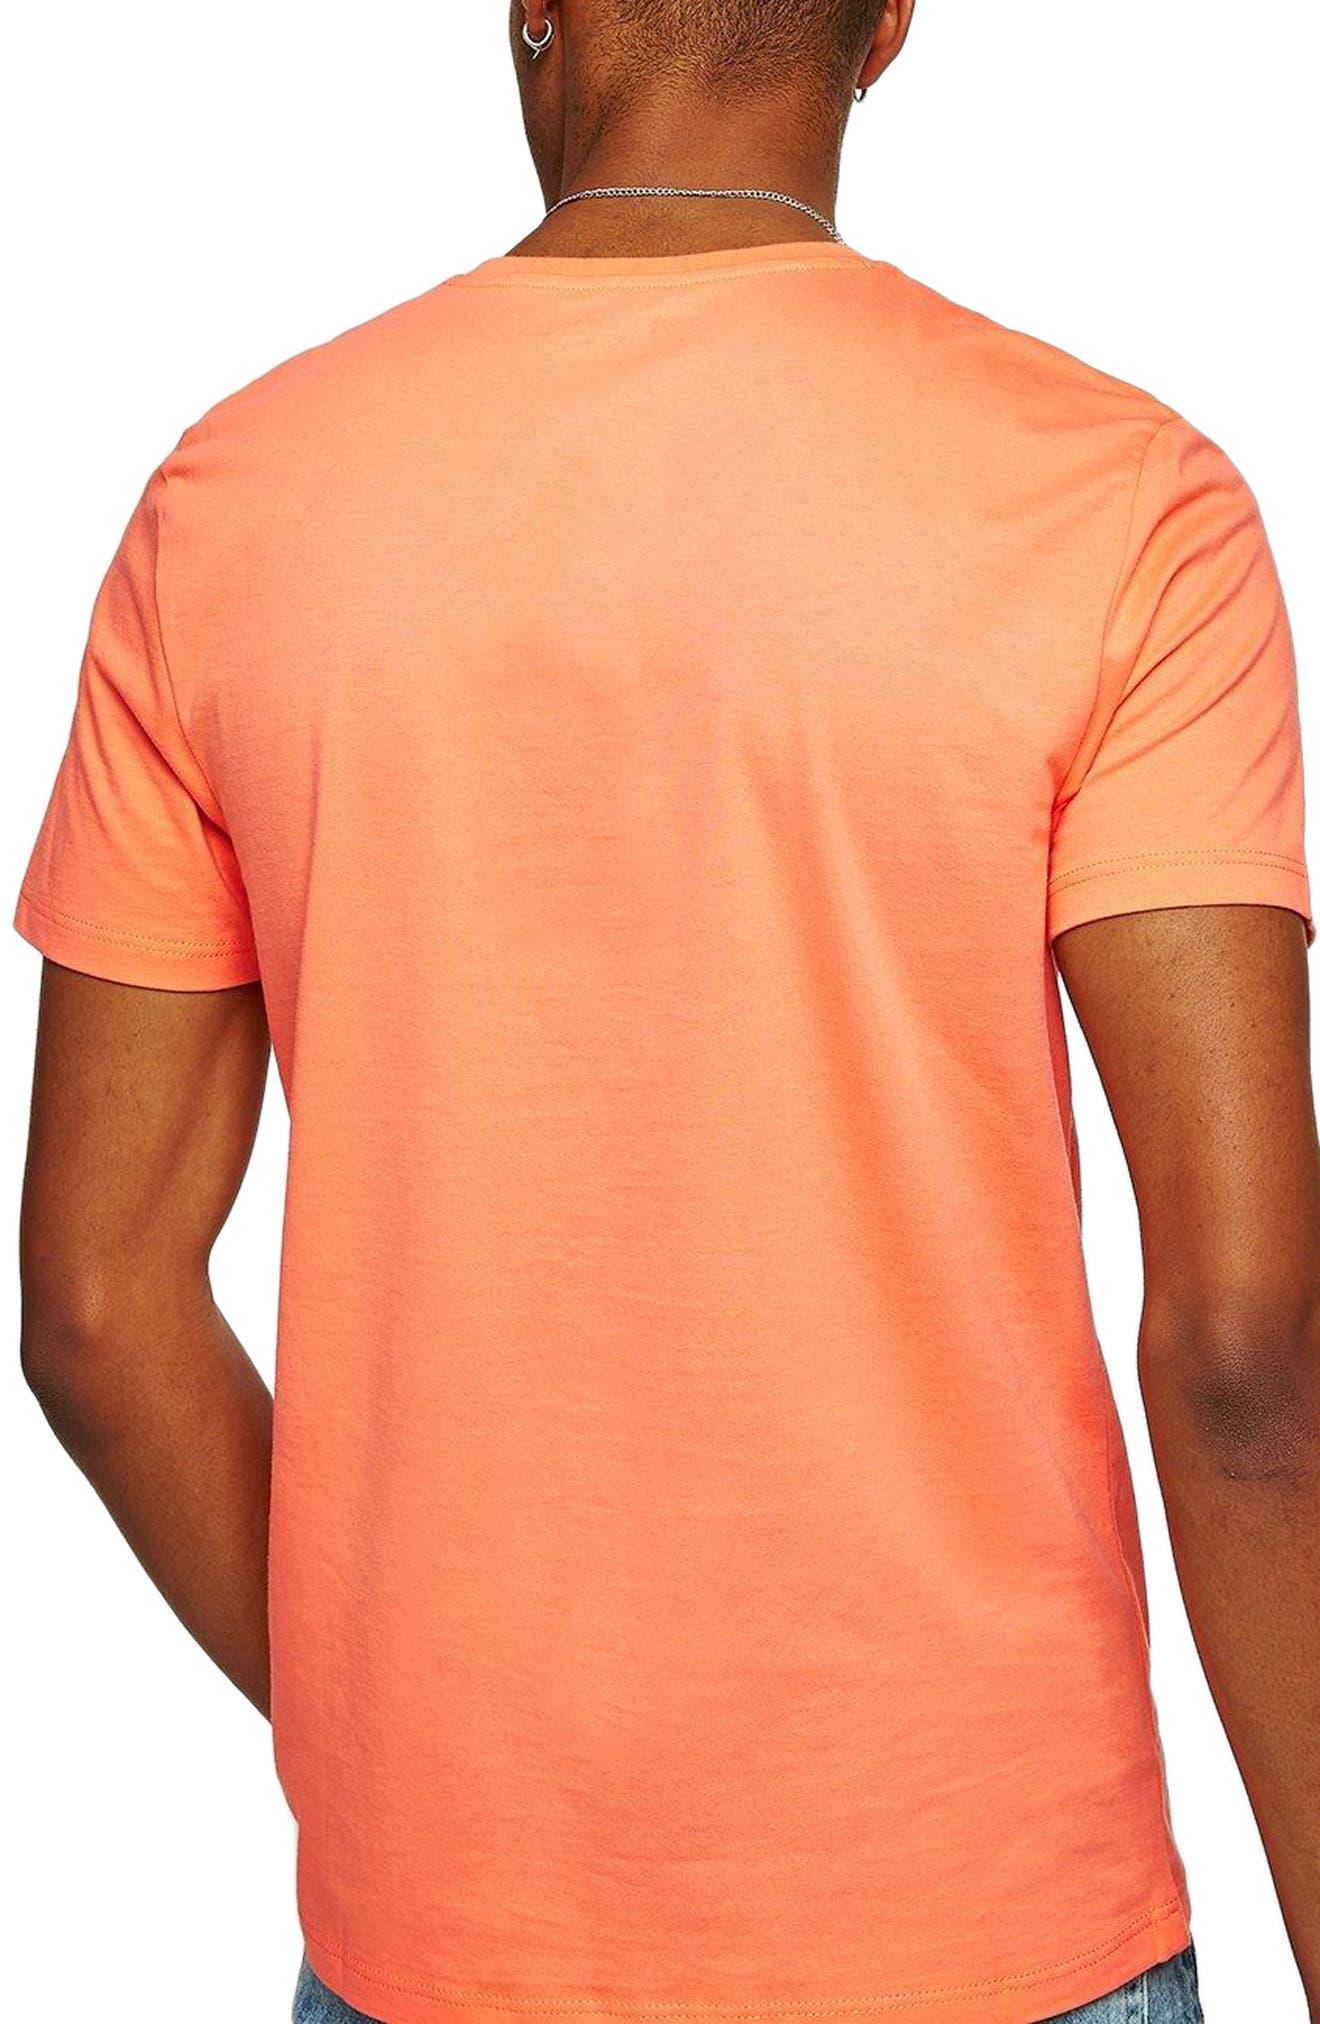 Slim Fit Crewneck T-Shirt,                             Alternate thumbnail 127, color,